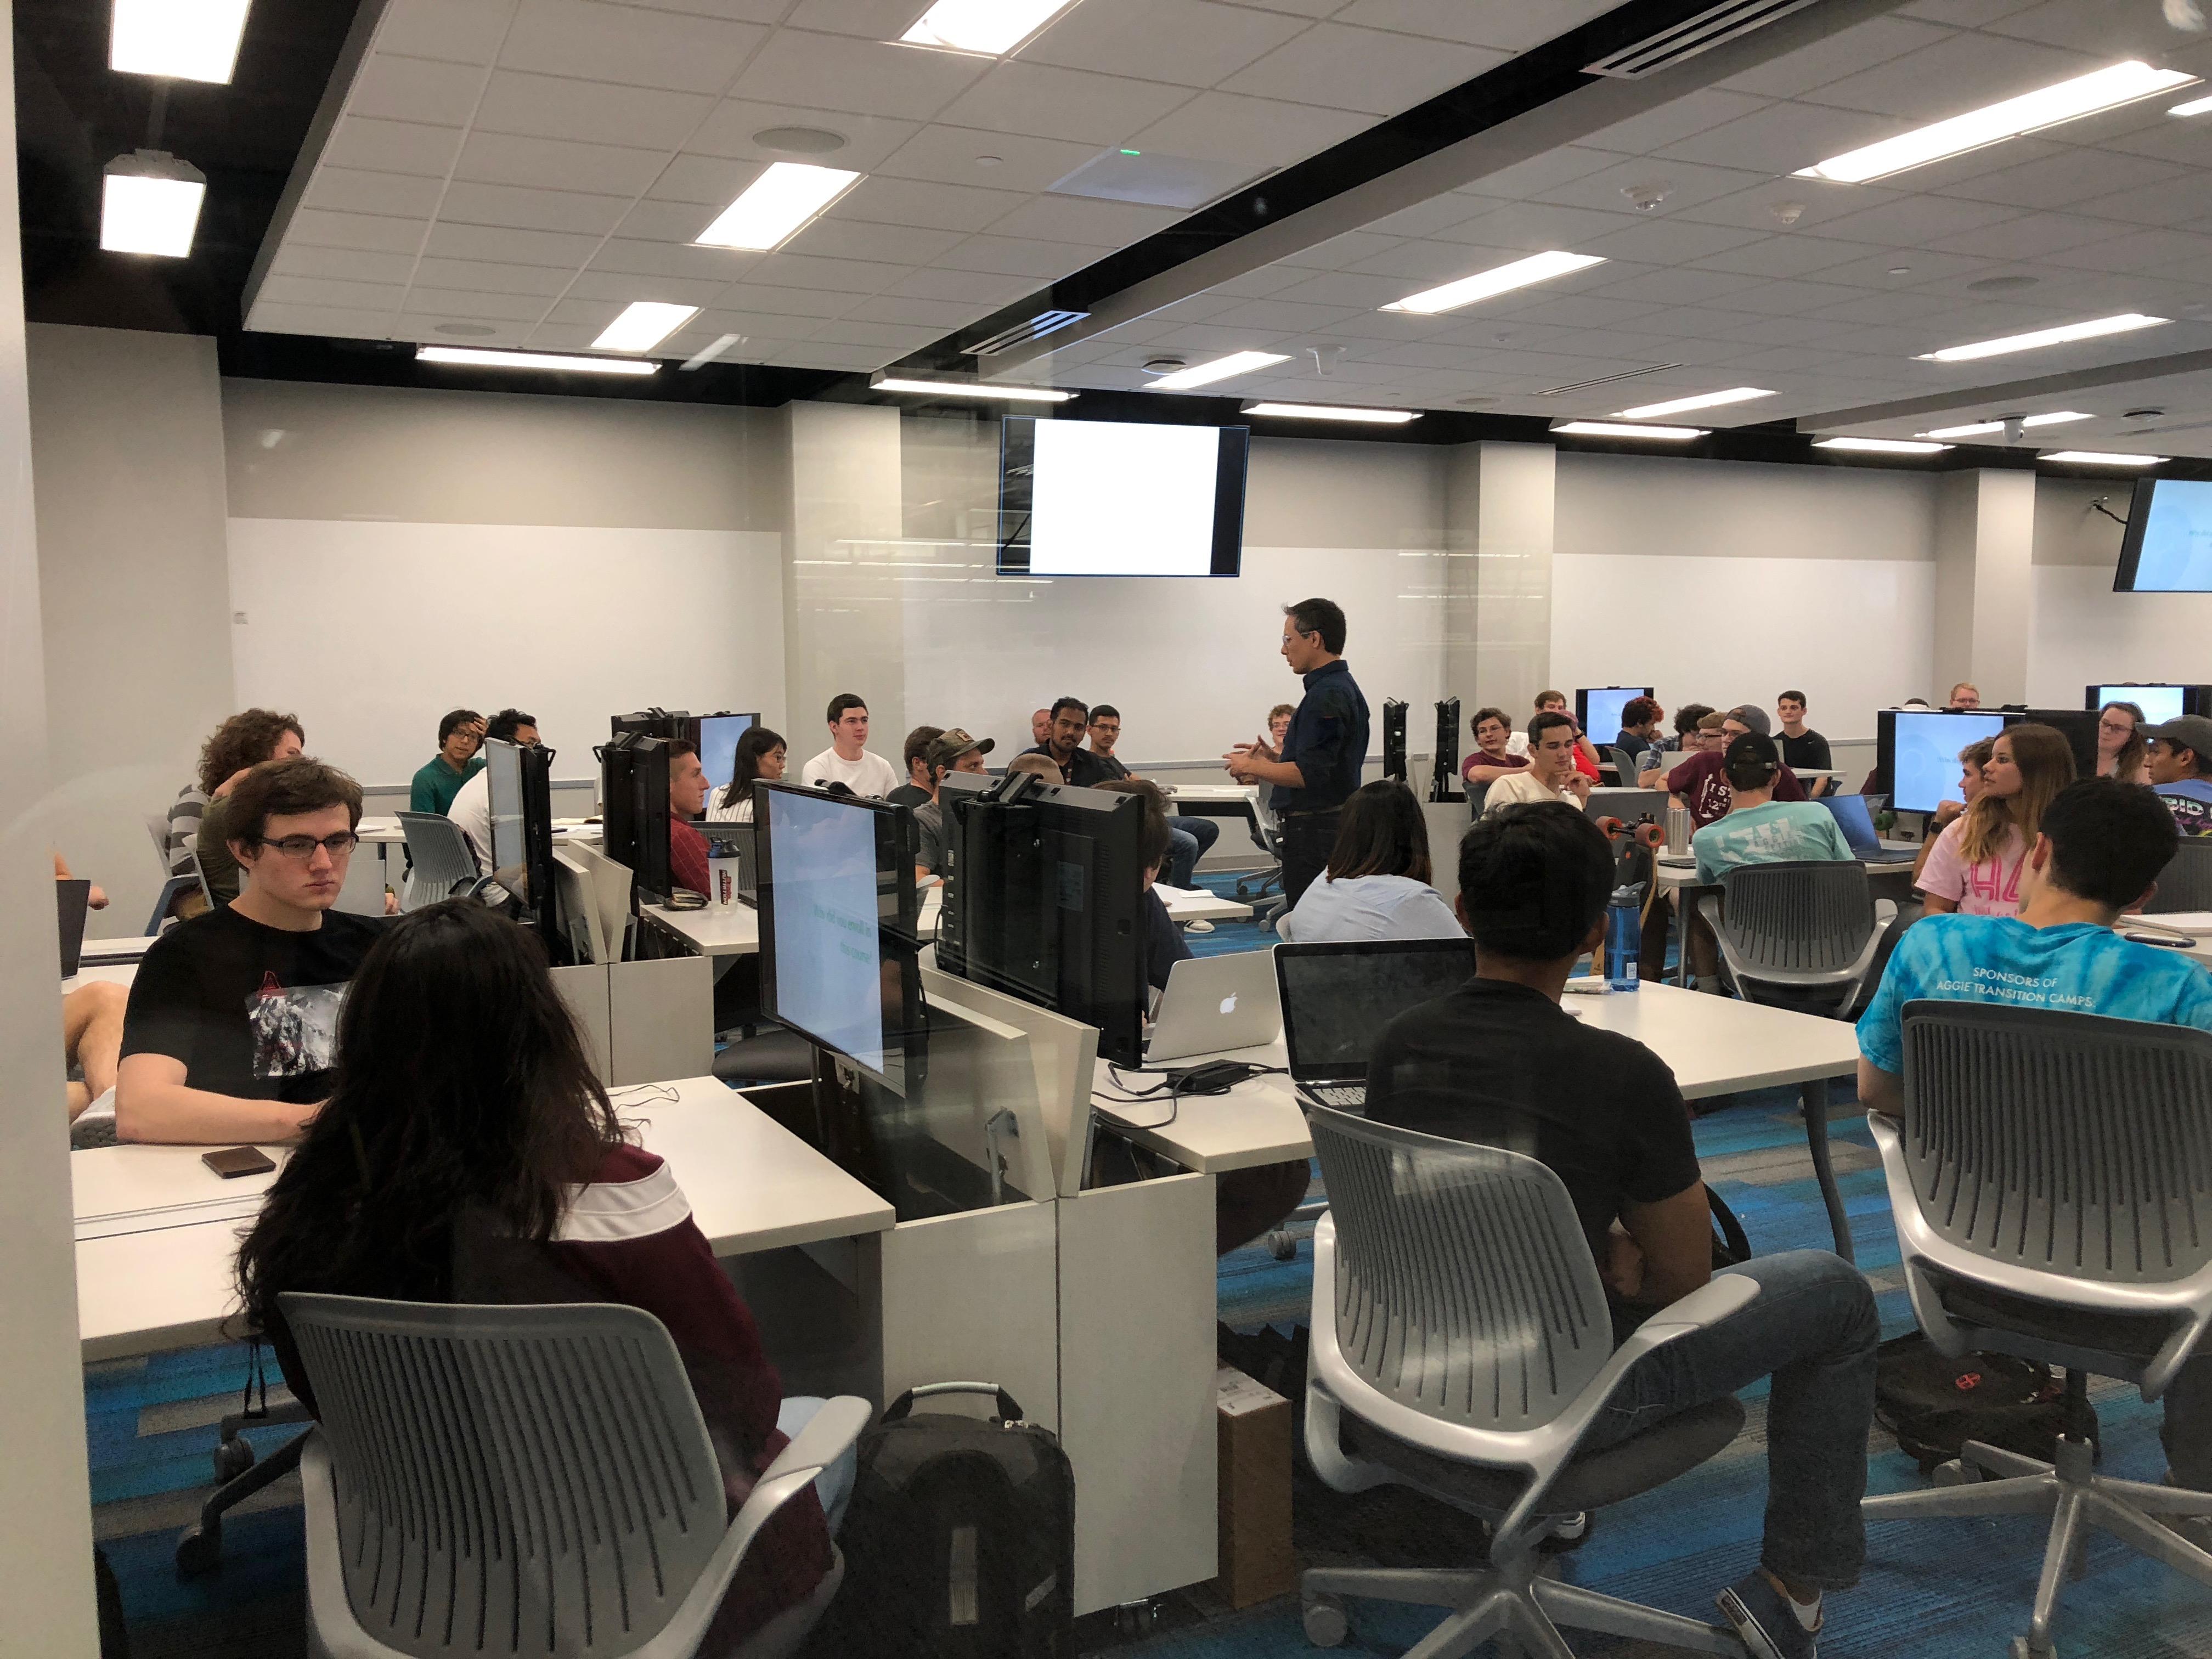 professor-teach-class-active-learning-classroom (3)